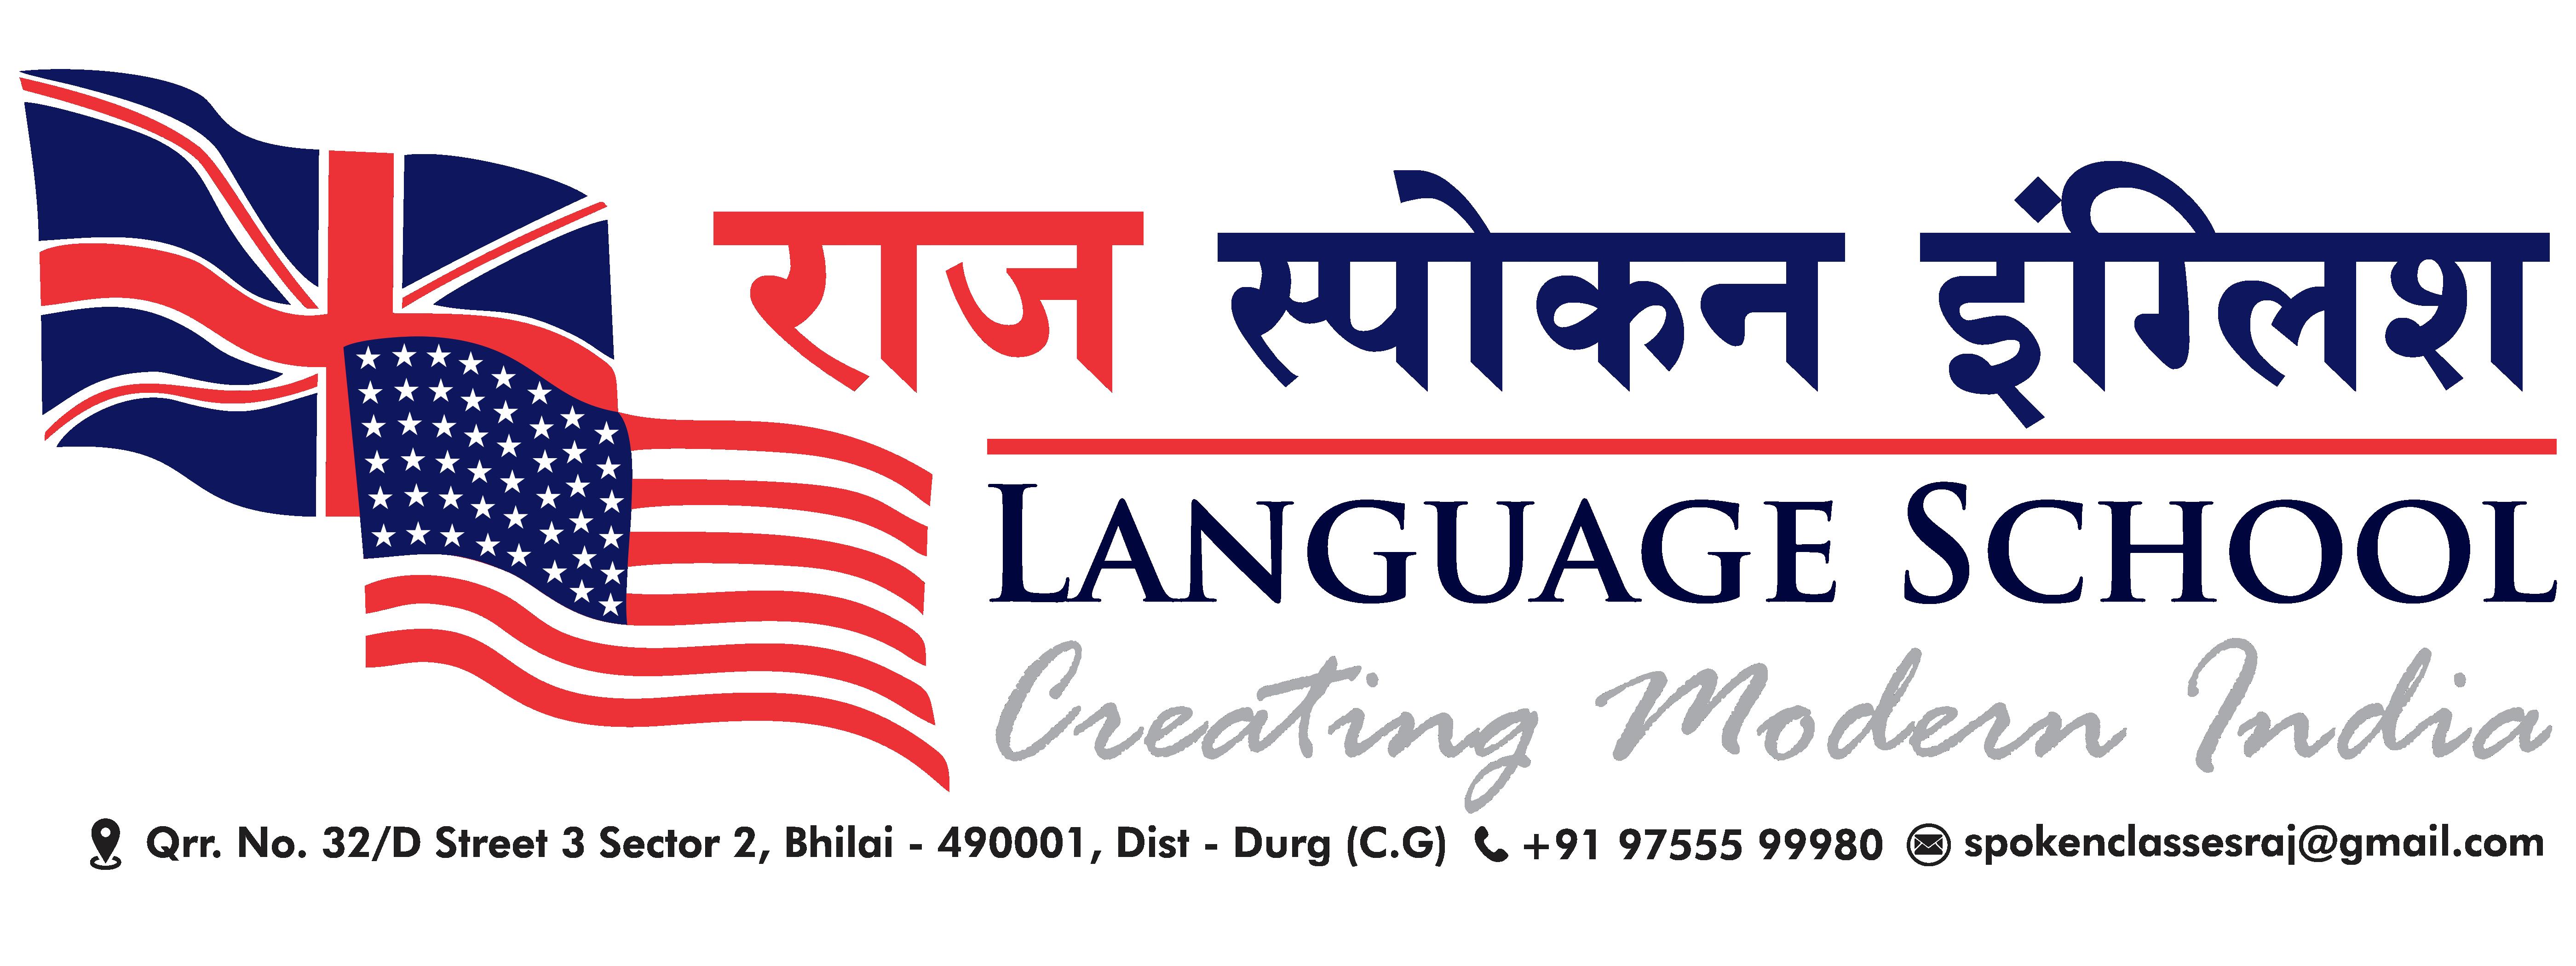 Best spoken English class Raj Spoken English class Bhilai Mo 9755599980